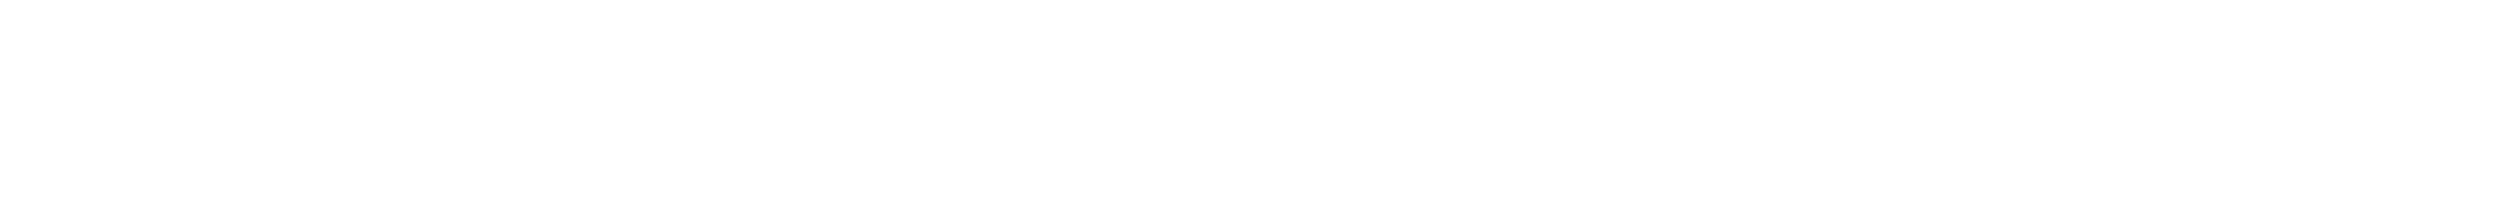 whitelines-01-01.png